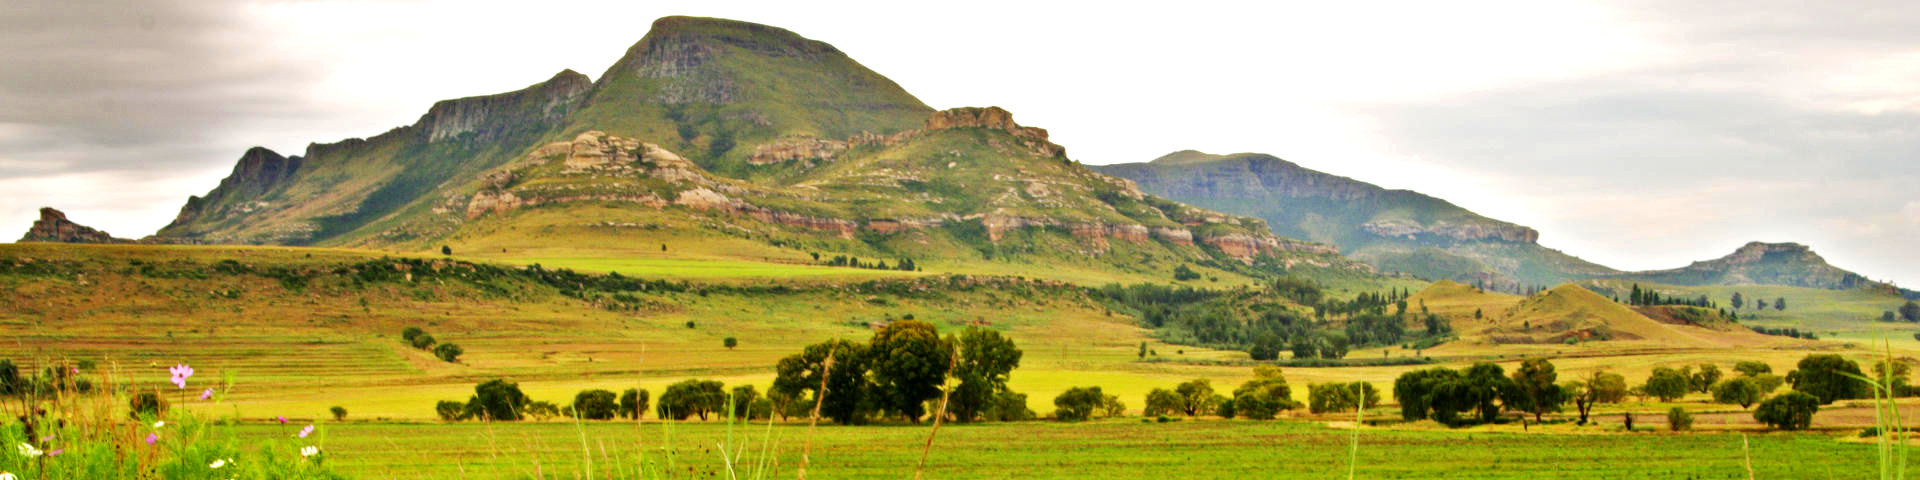 Bloemfontein south africa hero